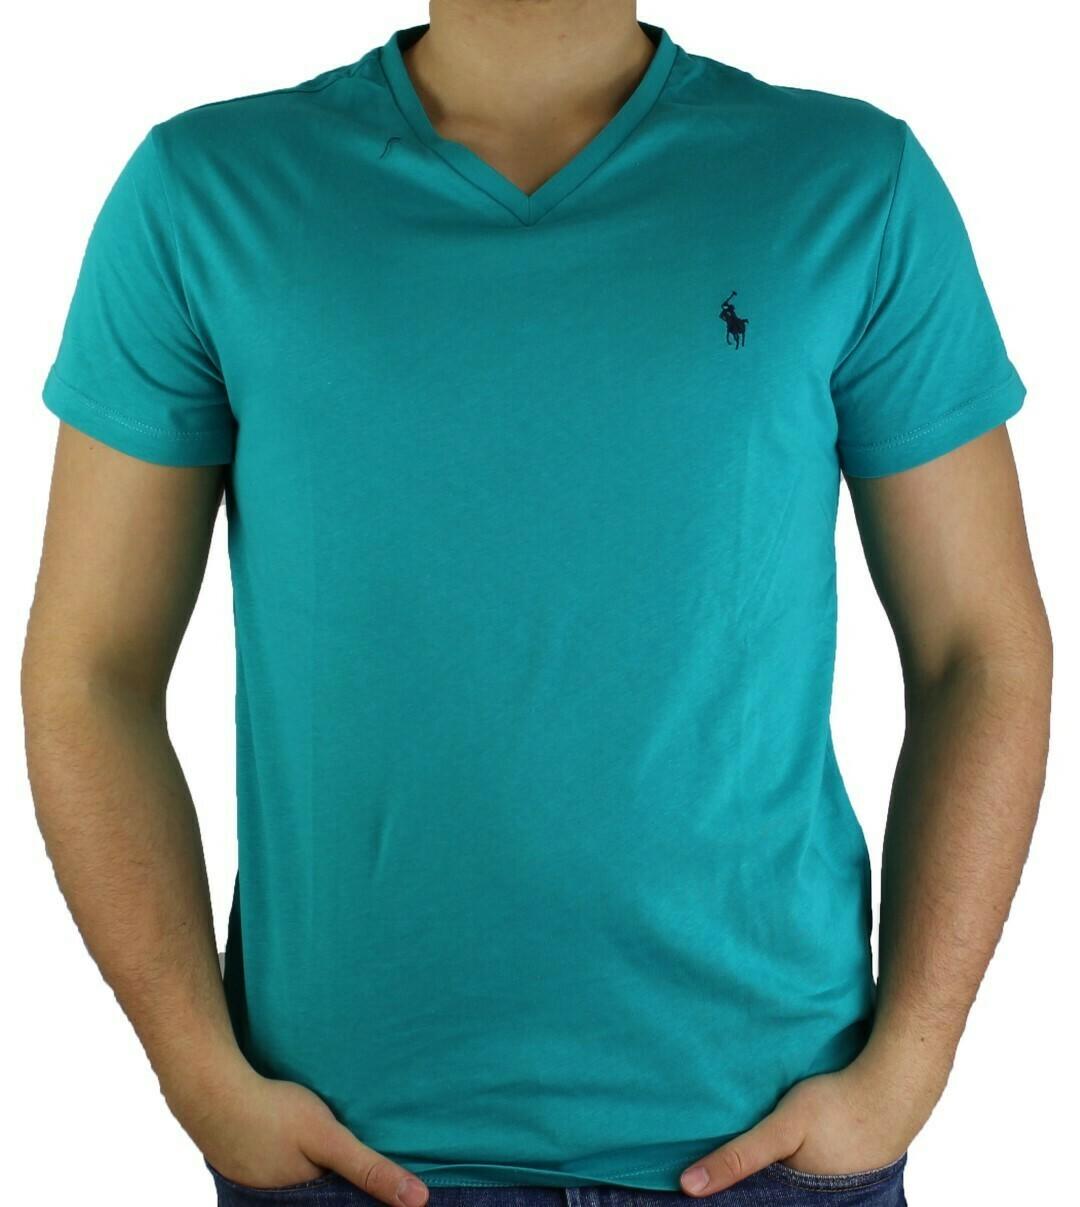 Ralph Lauren V - Neck Men's T-Shirt Green